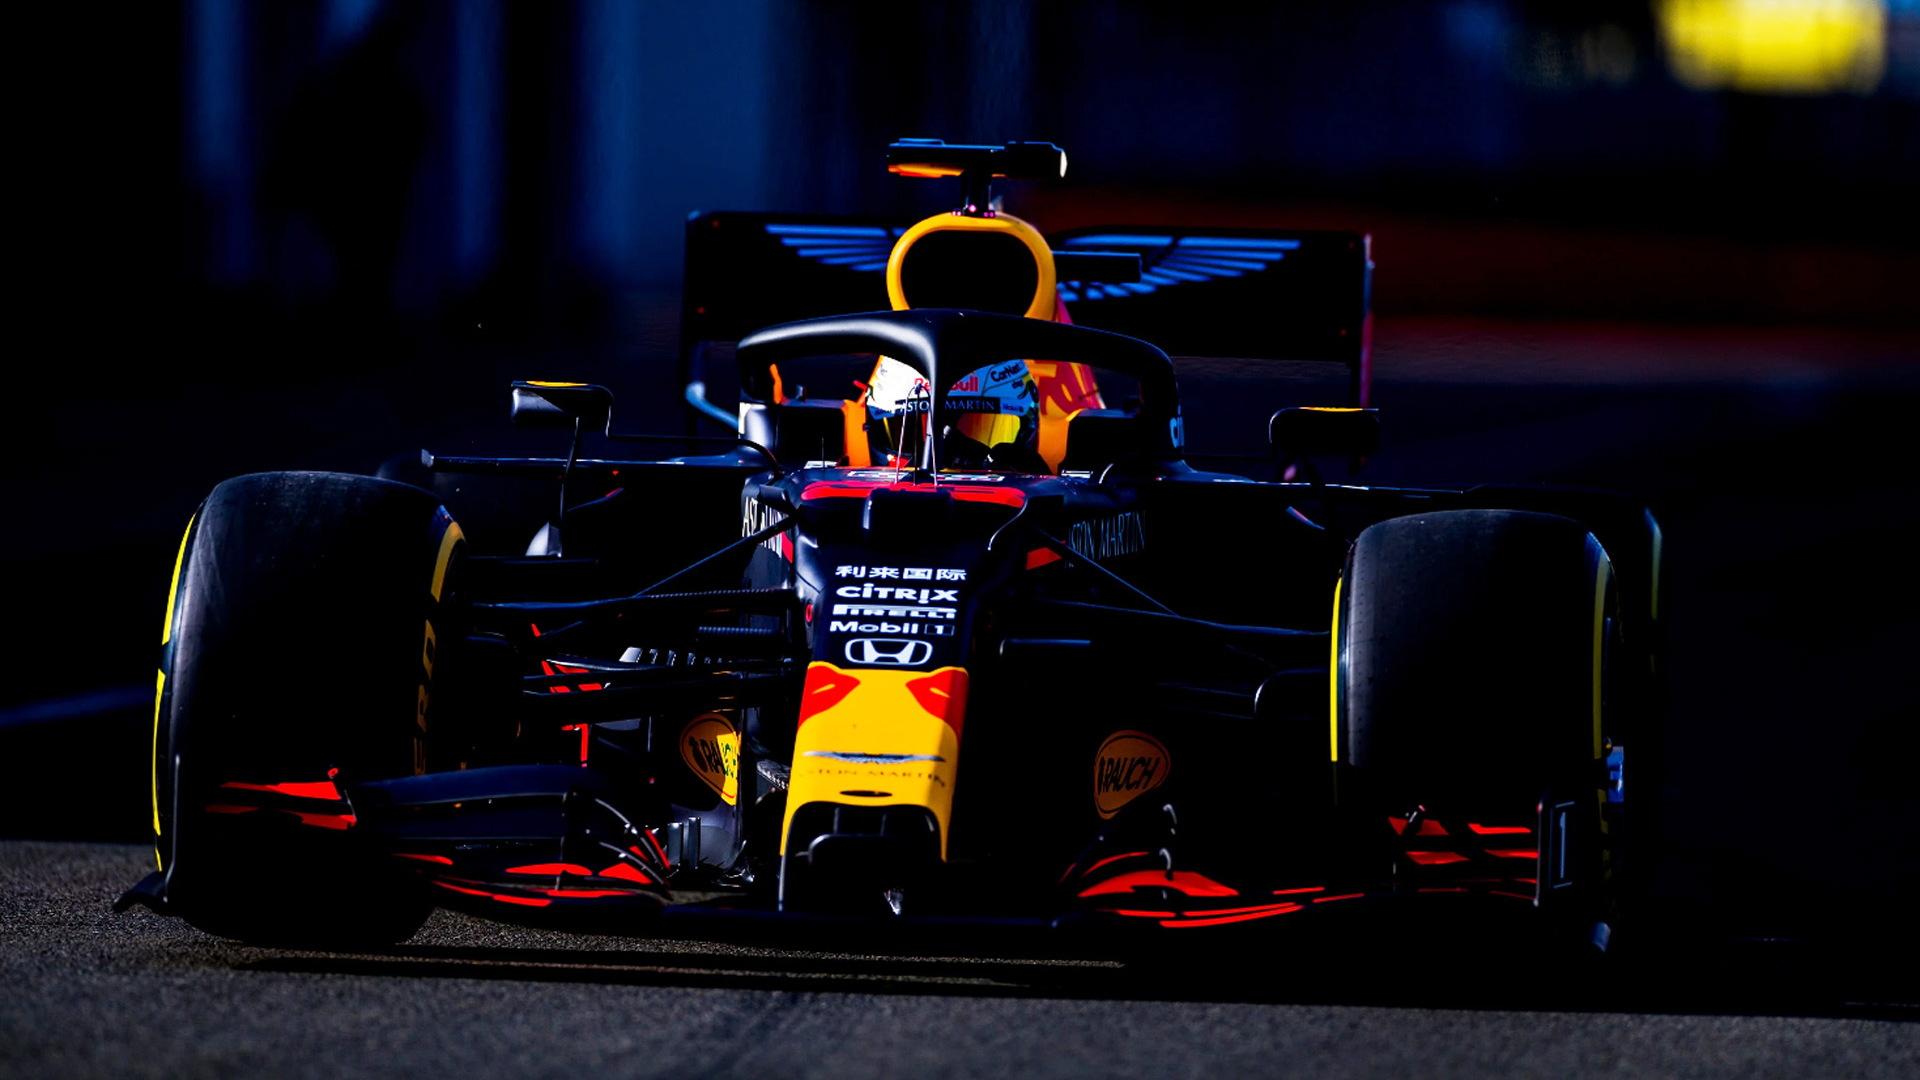 2020 Red Bull Racing RB16 Formula One car